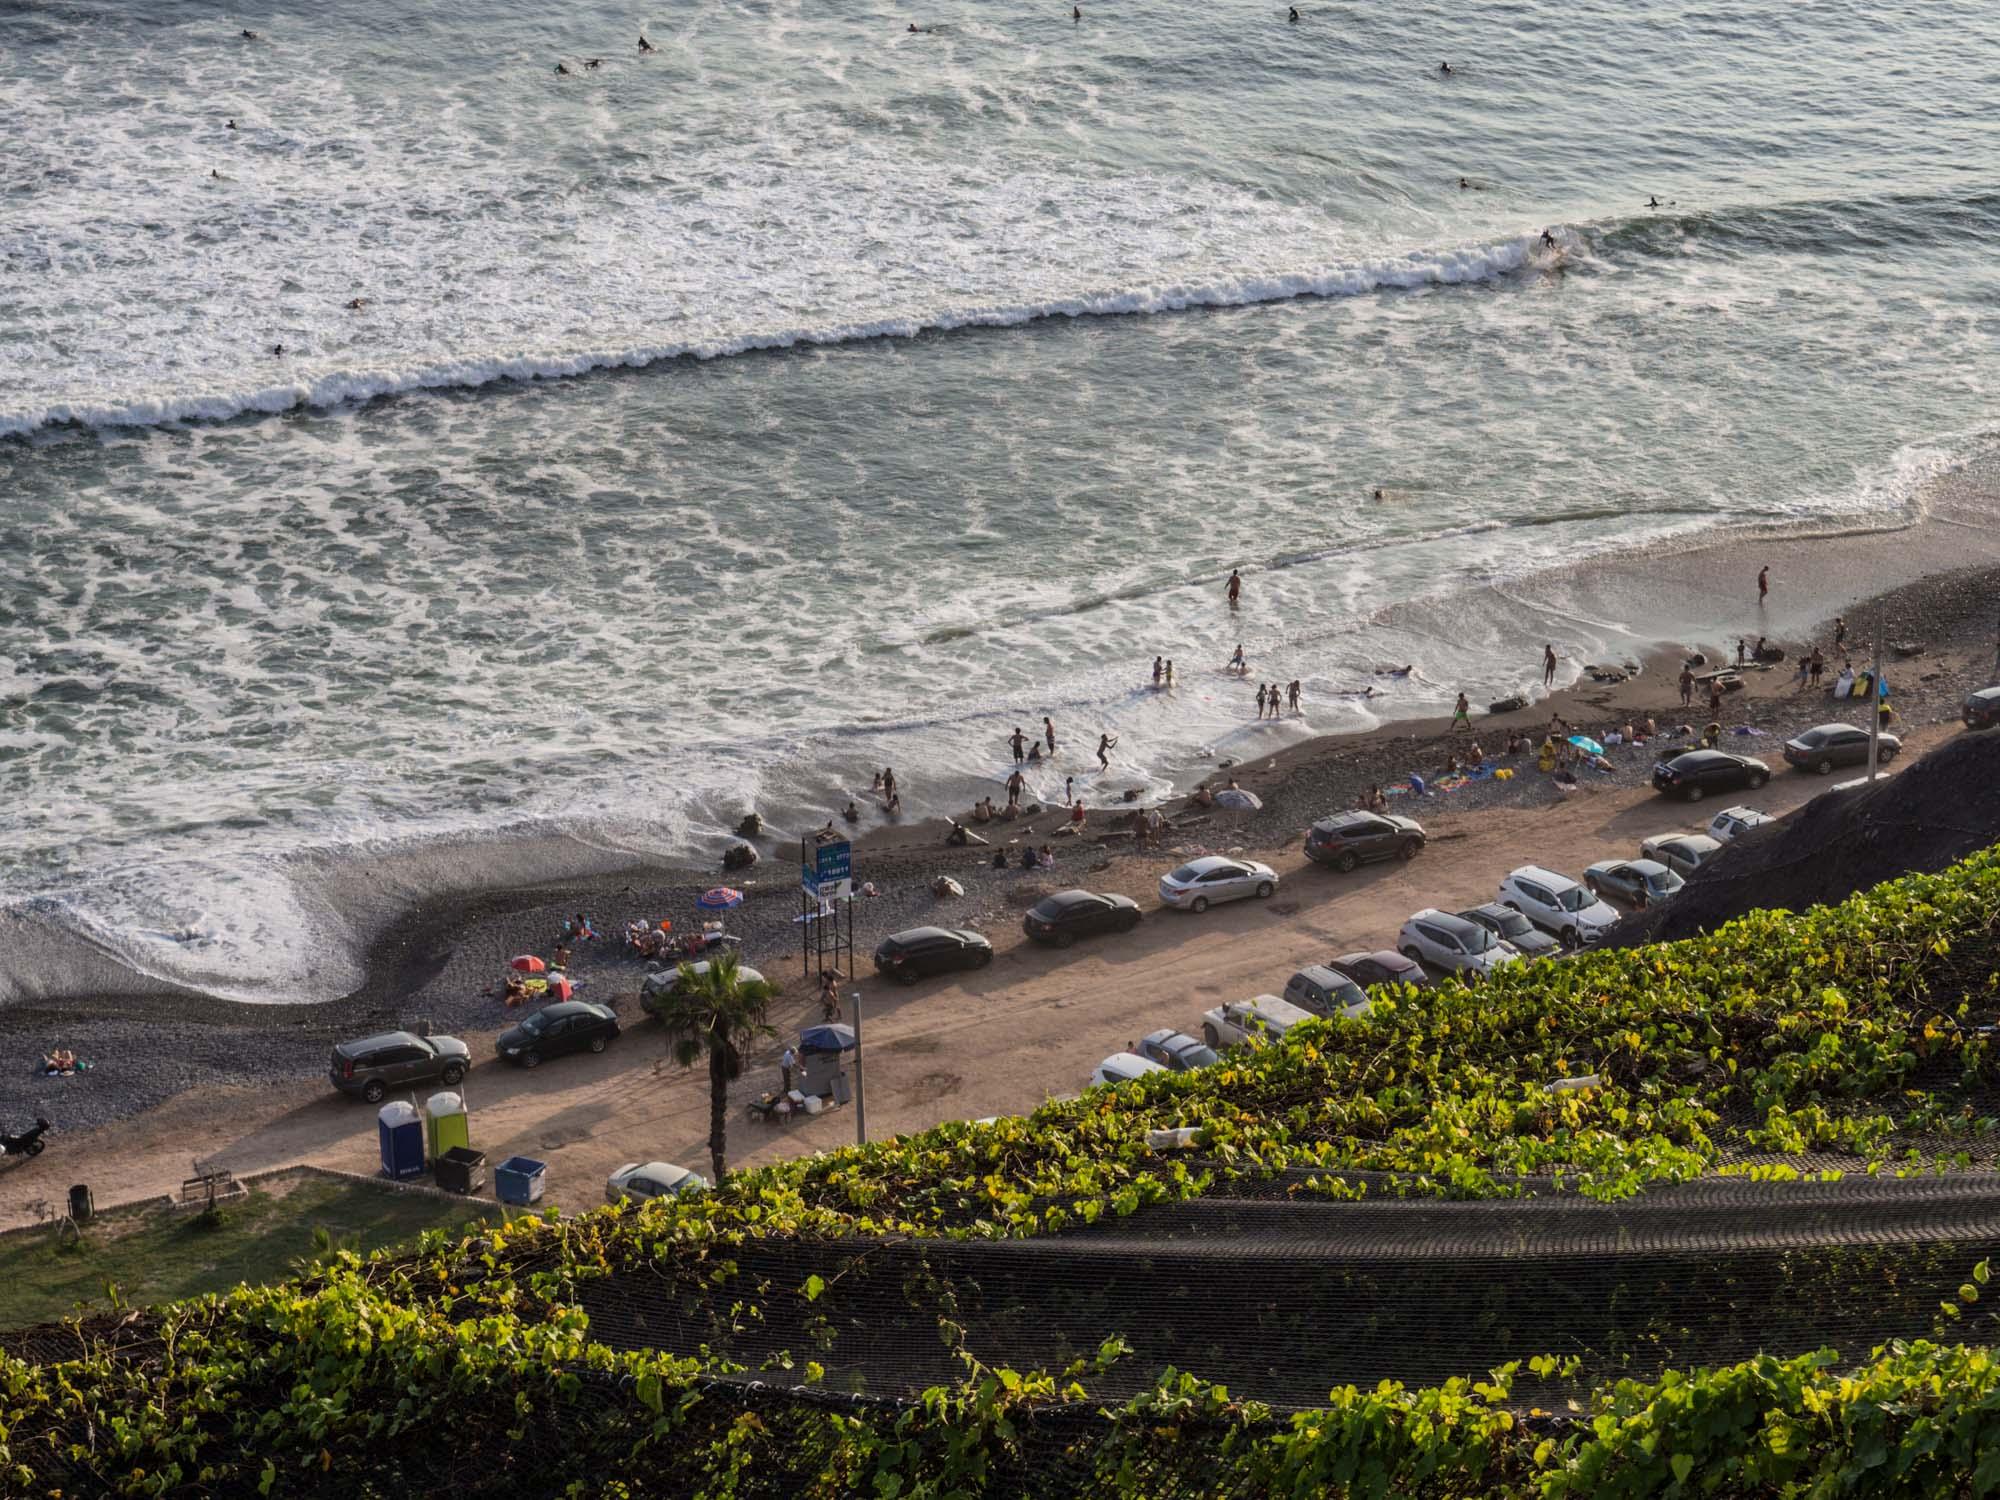 Surfers Lima Peru